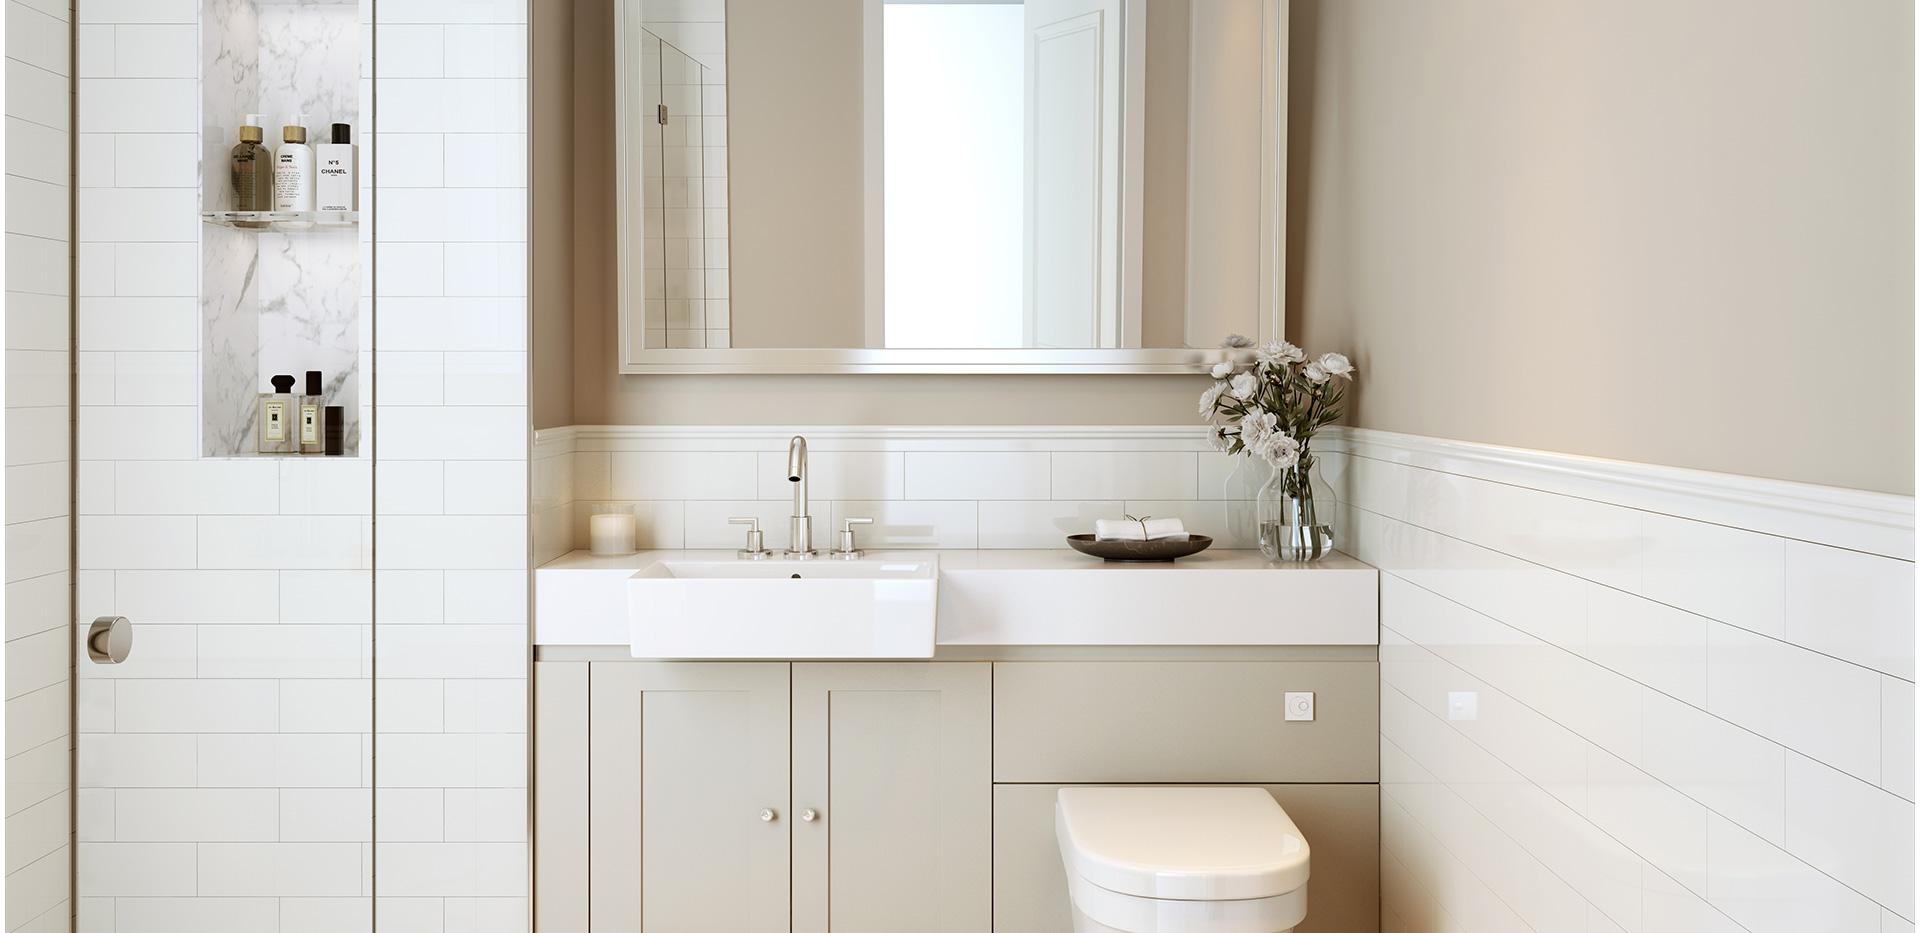 Berkeley, Townhouse, Bathroom, Interior View